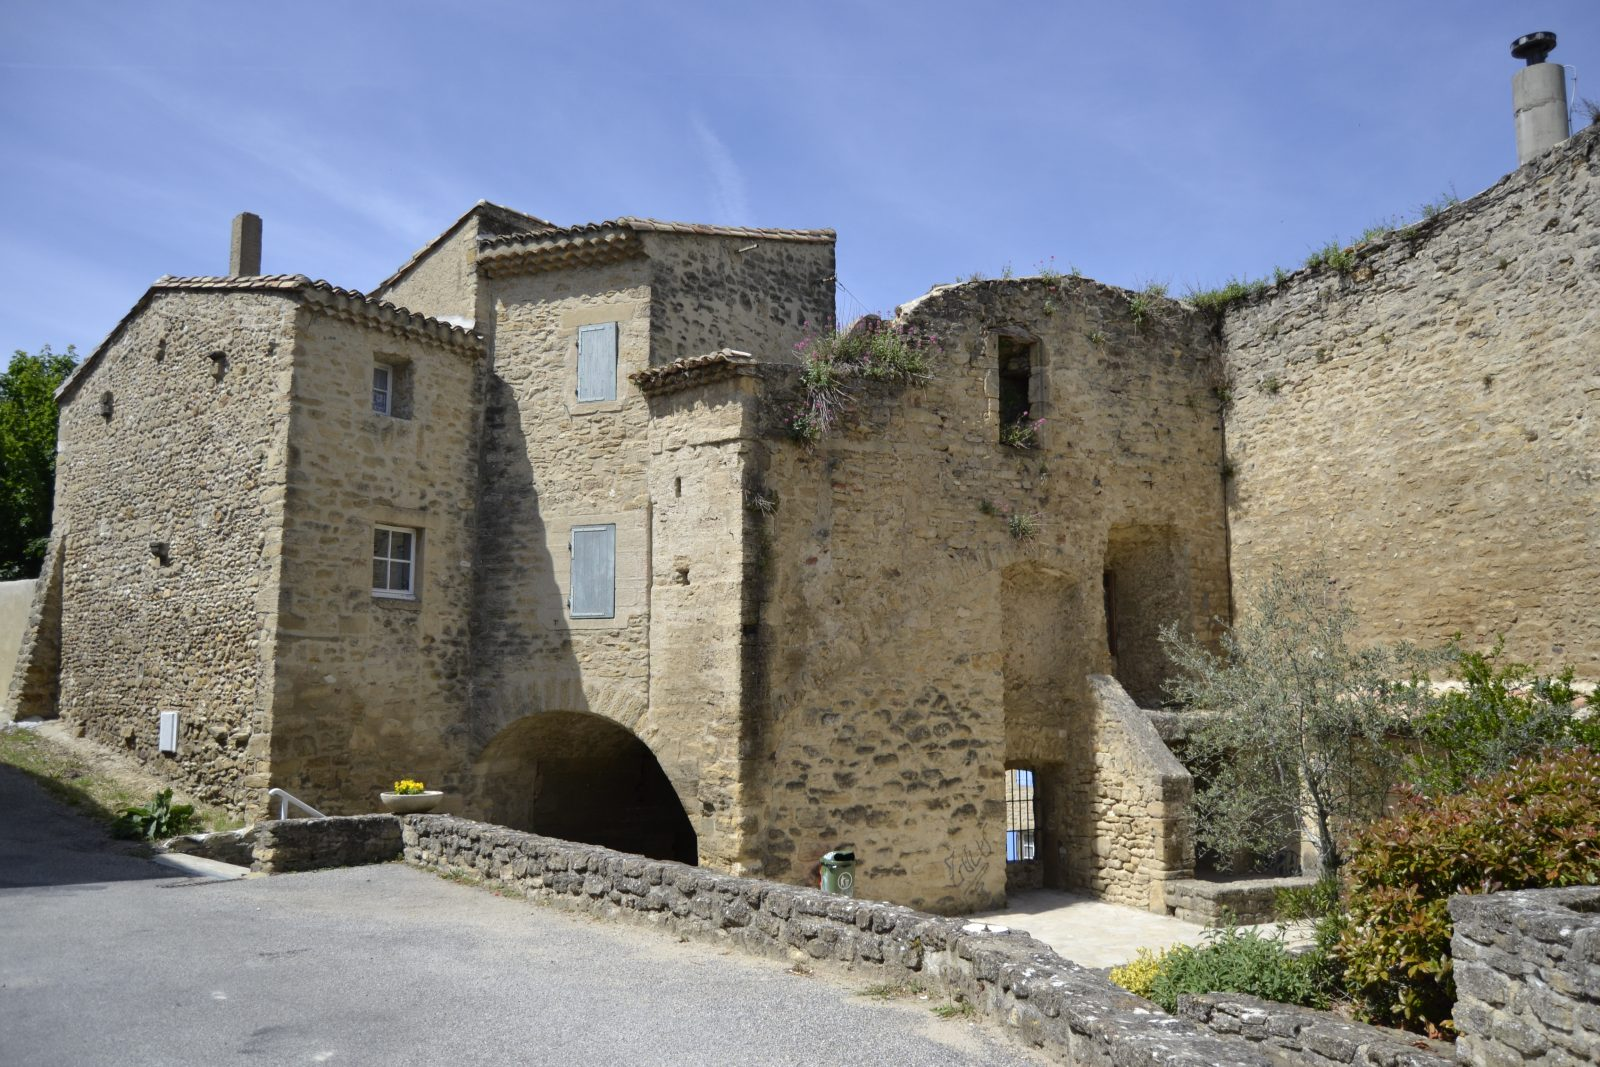 Montoison